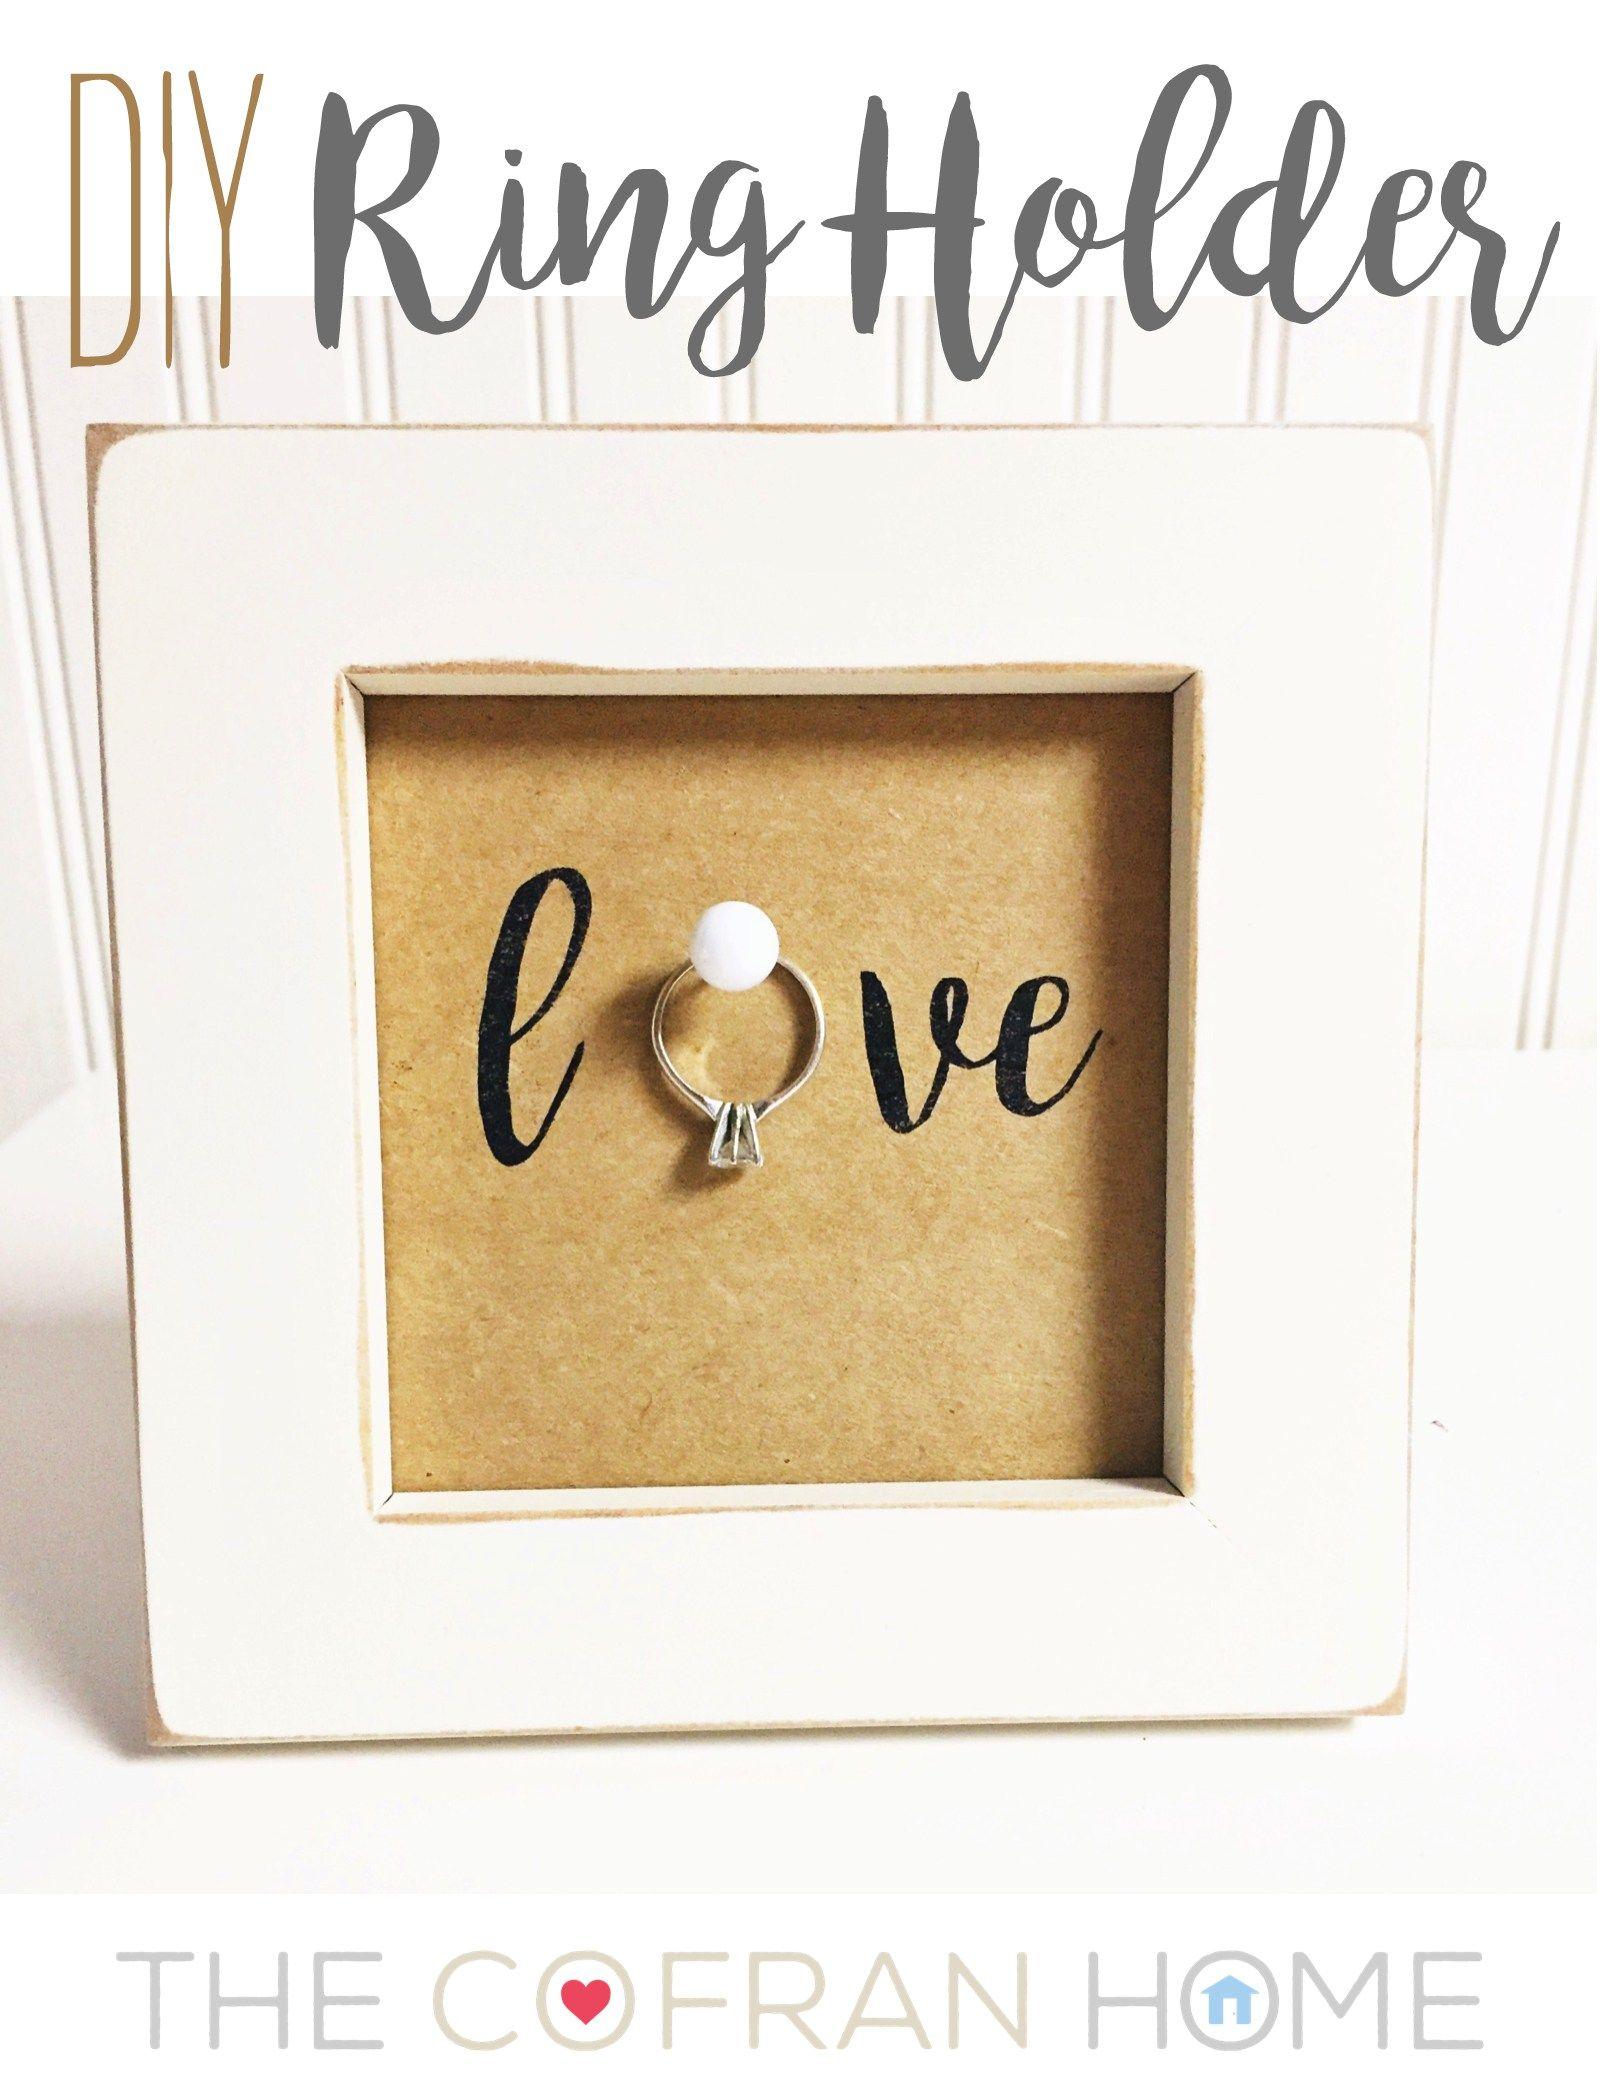 DIY Ring Holder Diy wedding gifts, Creative wedding